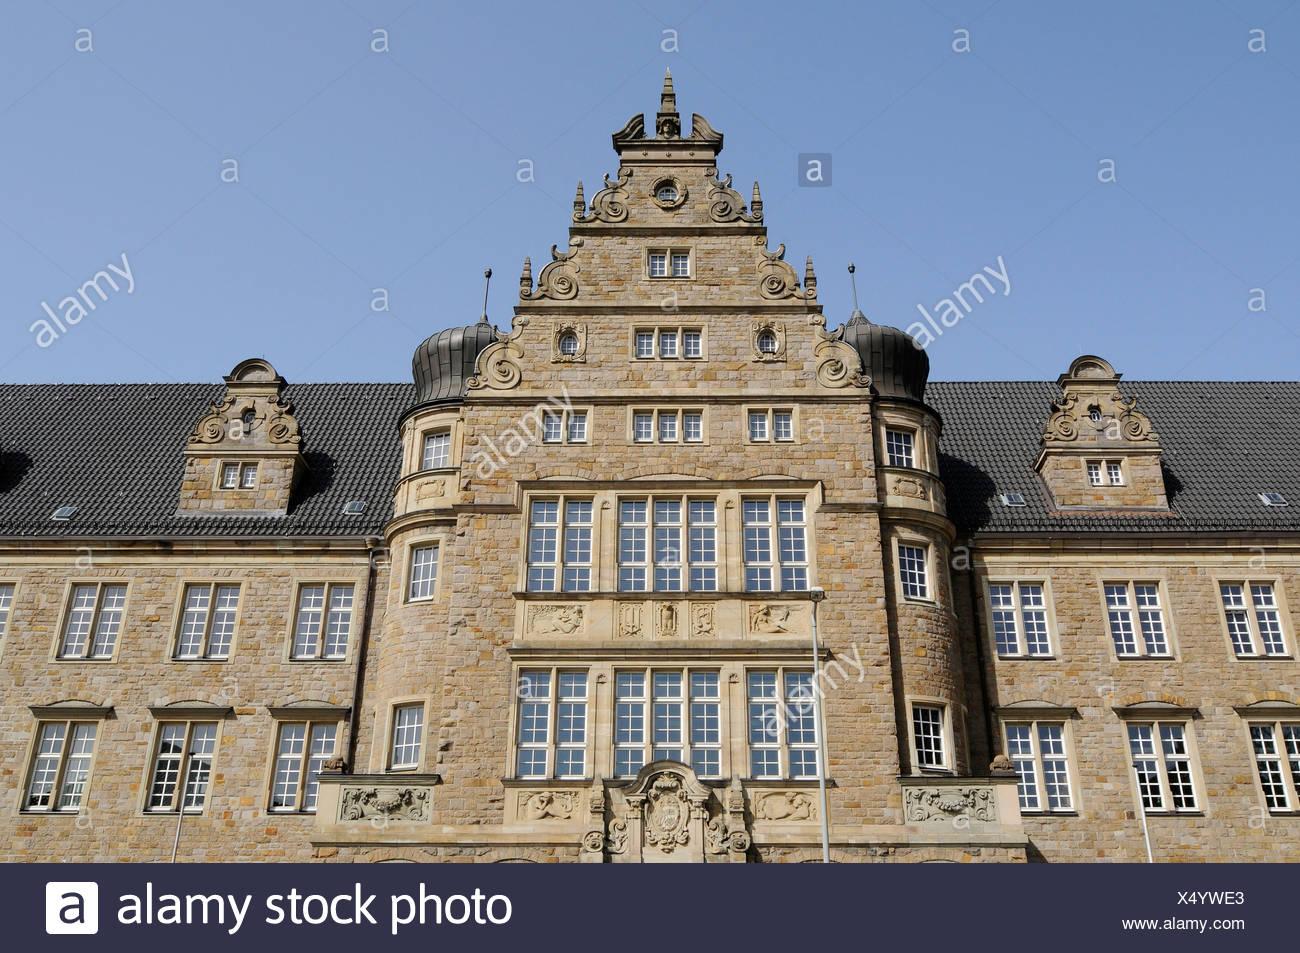 District Court, Neo-Renaissance, Oberhausen, Ruhrgebiet area, North Rhine-Westphalia, Germany, Europe - Stock Image